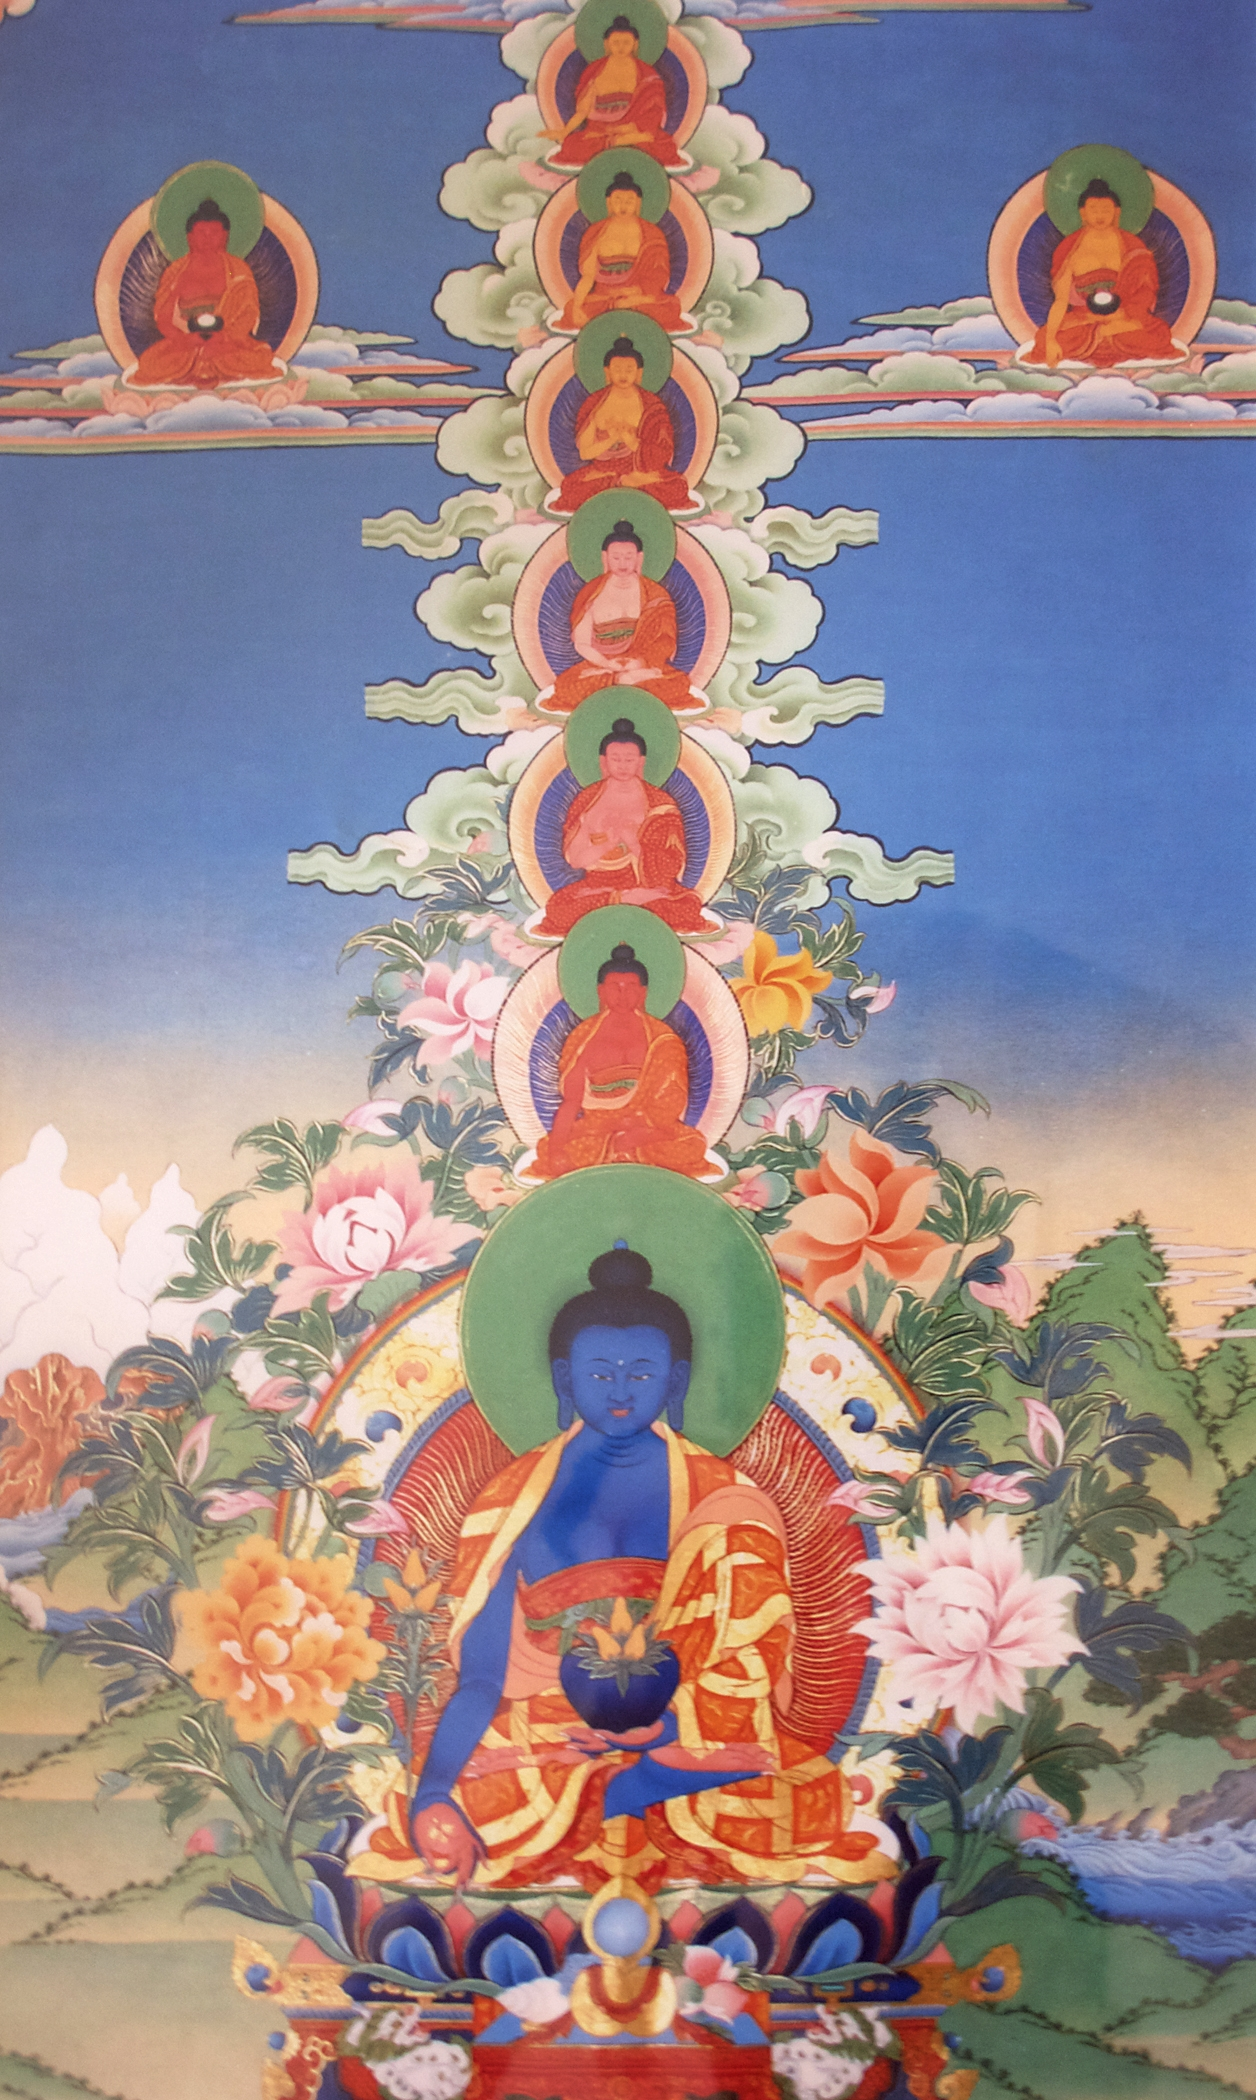 The Concise Sadhana of Medicine Guru Principal and Retinue  Dechen Ling PressDechen Ling Press